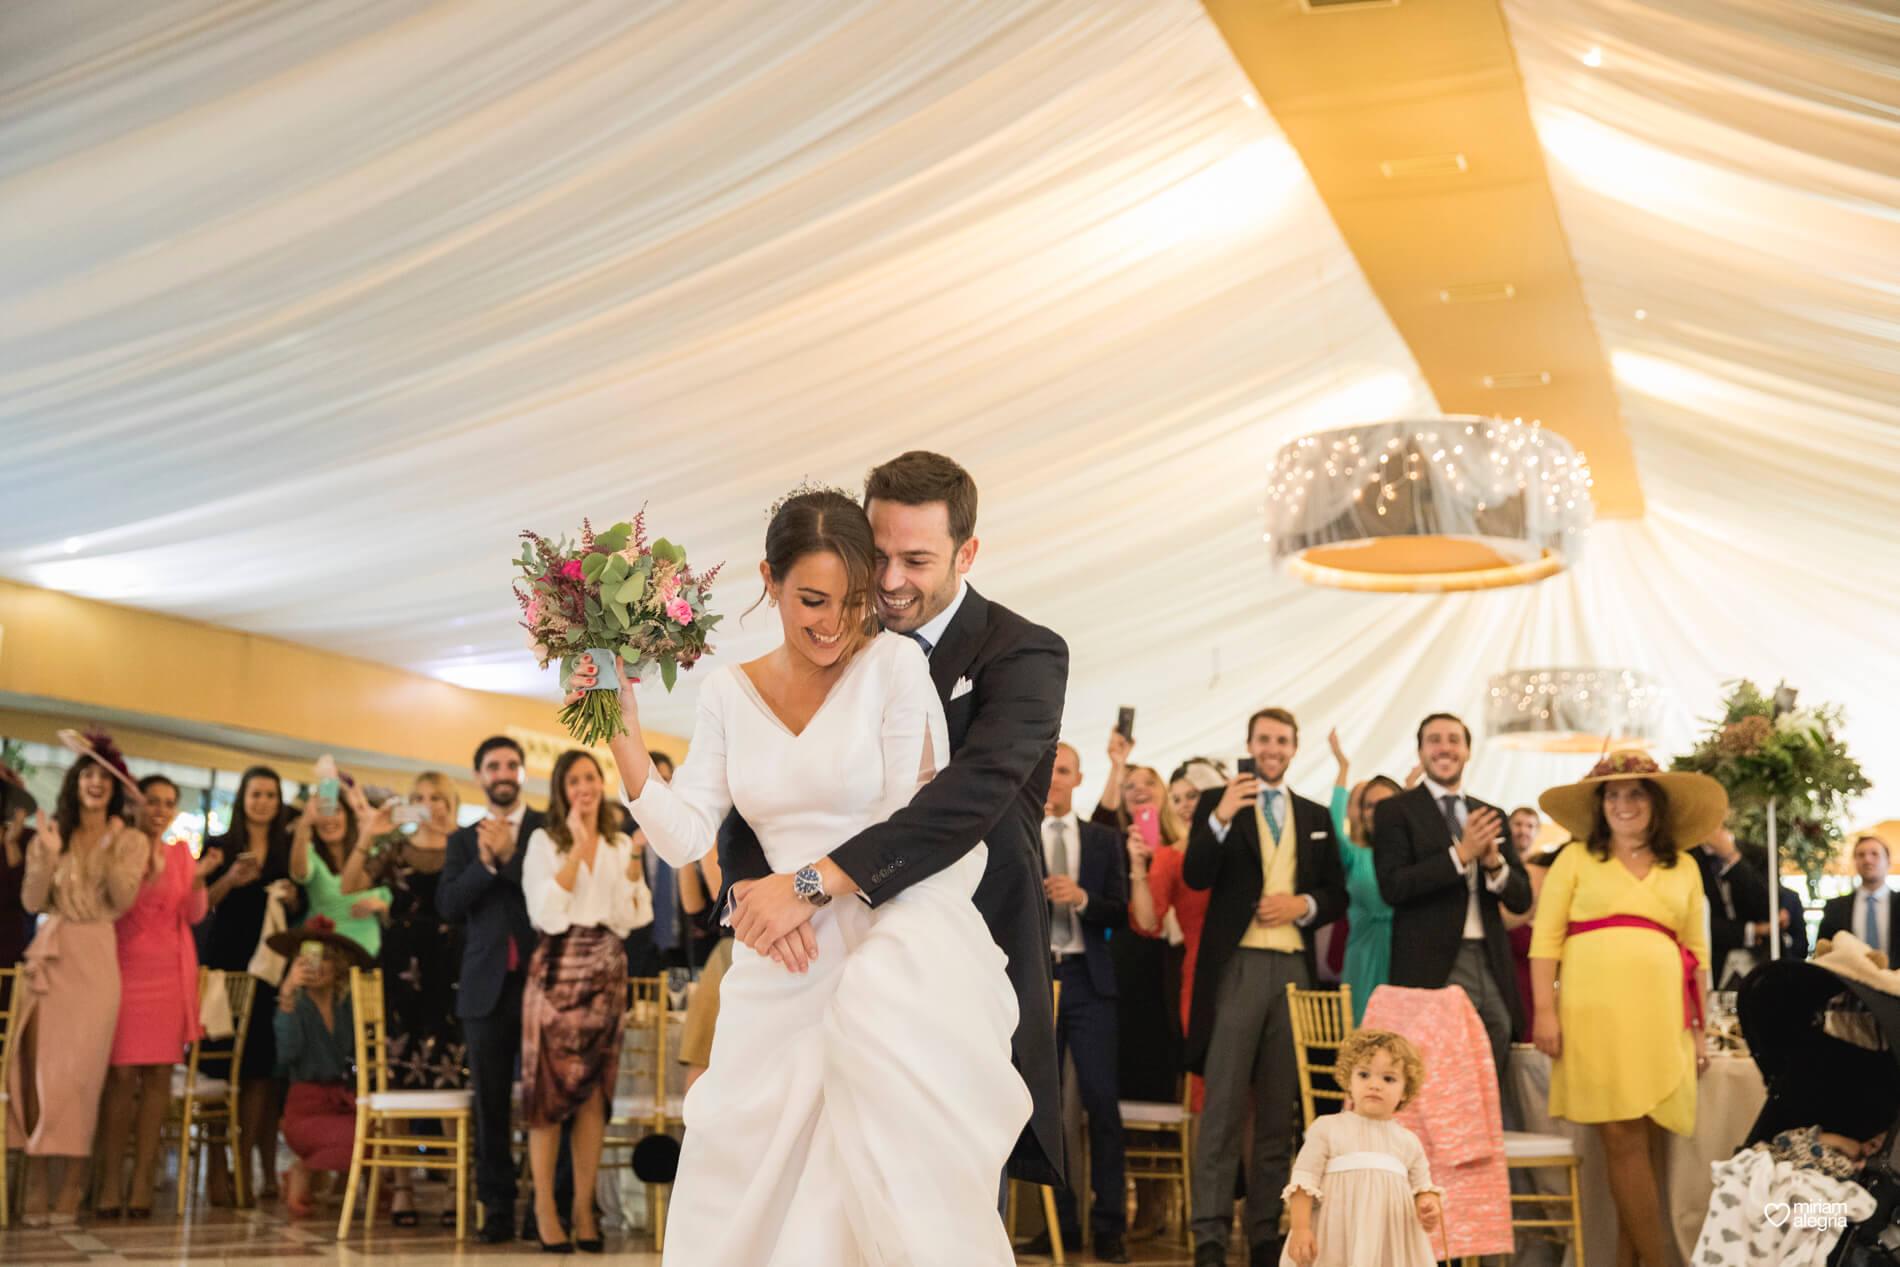 vestido-de-novia-paula-del-vas-miriam-alegria-fotografos-boda-murcia-116